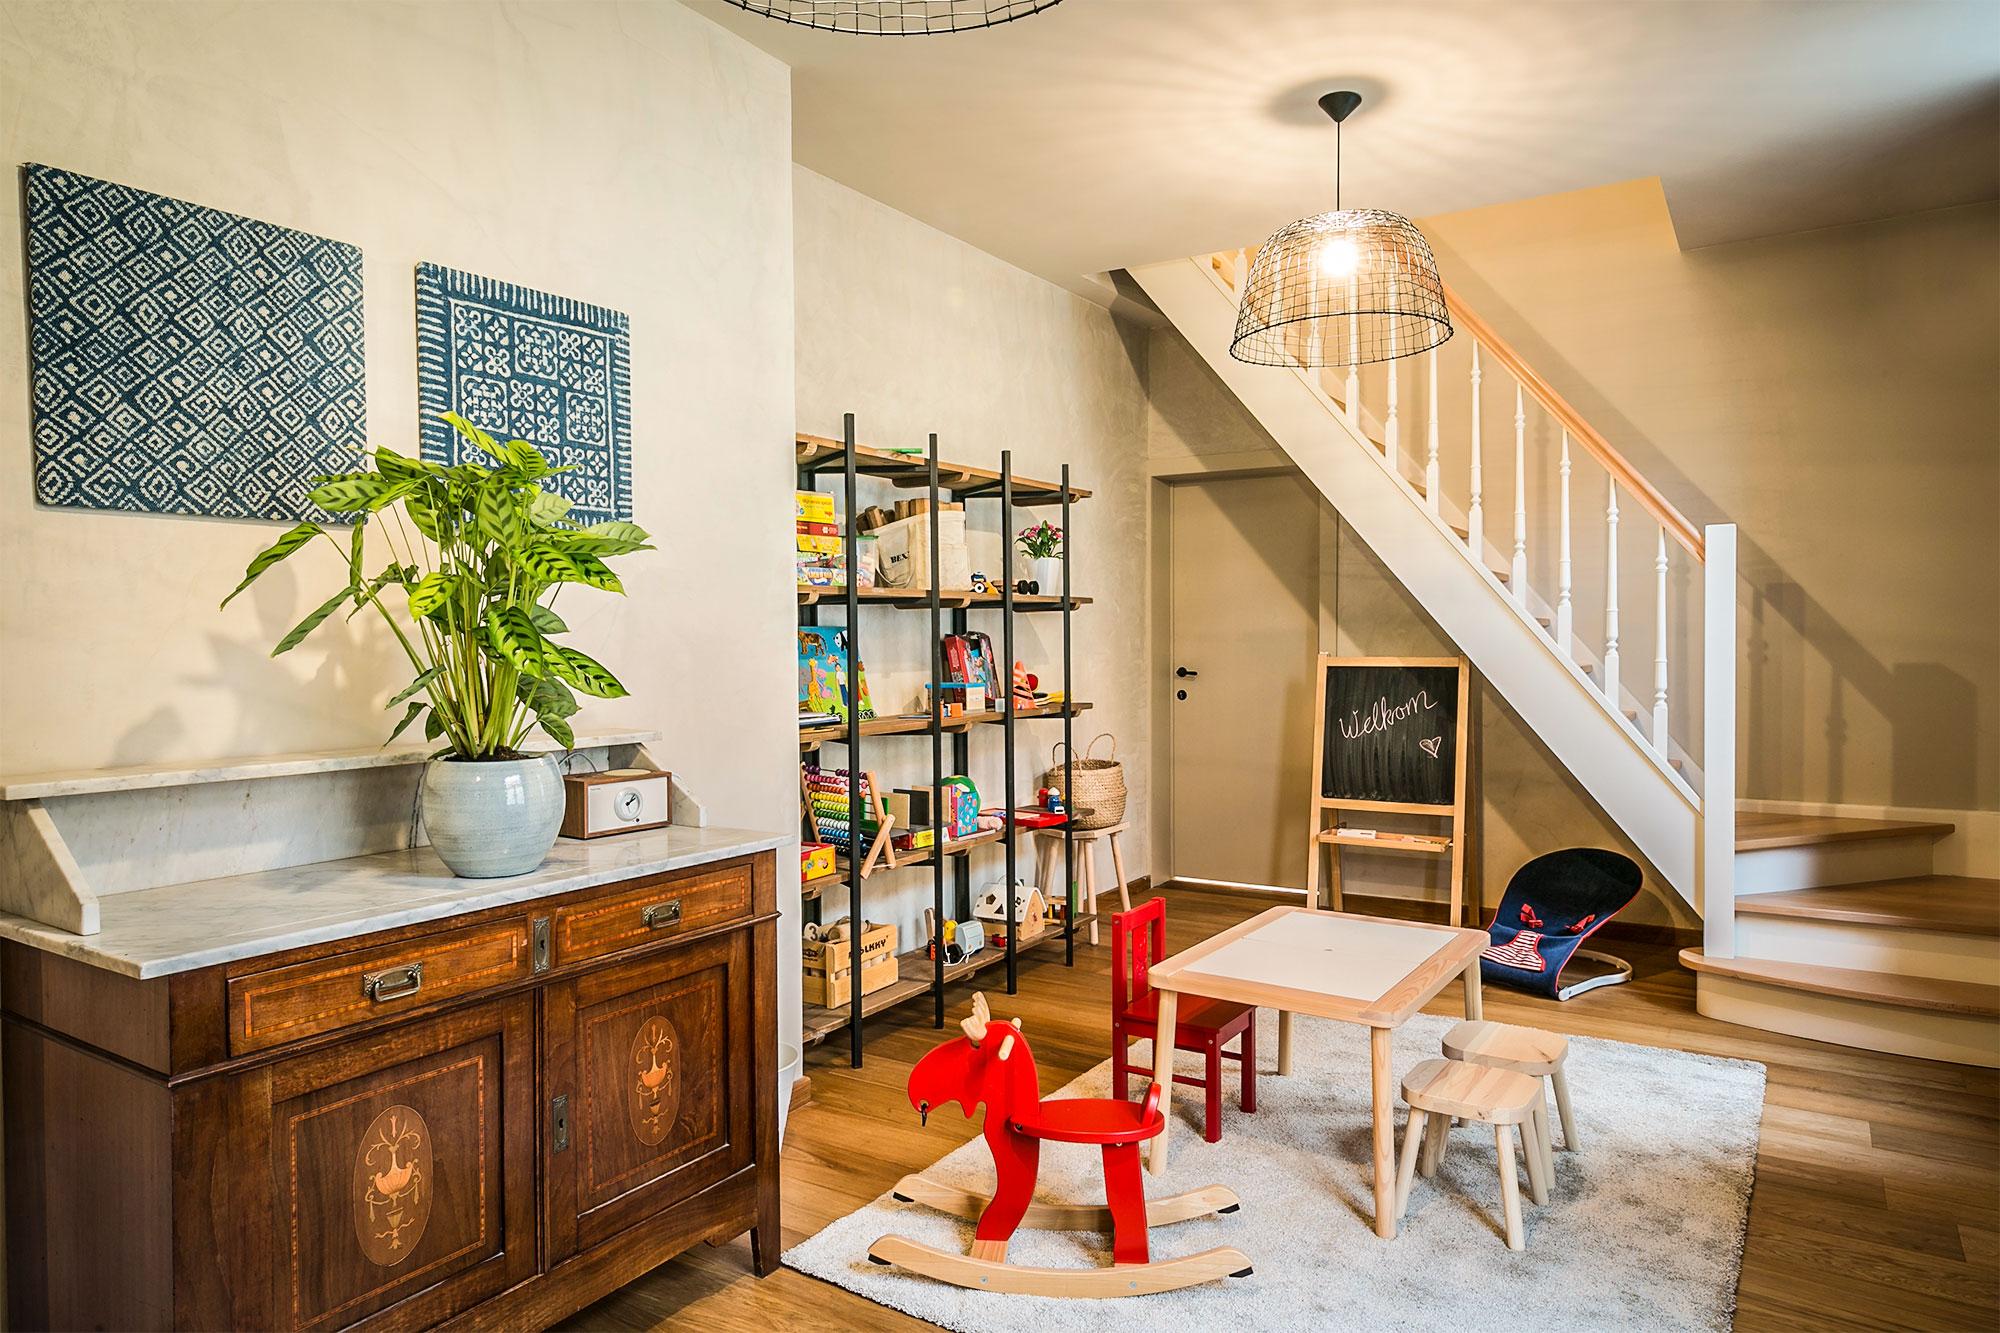 Vakantiehuis te huur - speelkamer met speelgoed